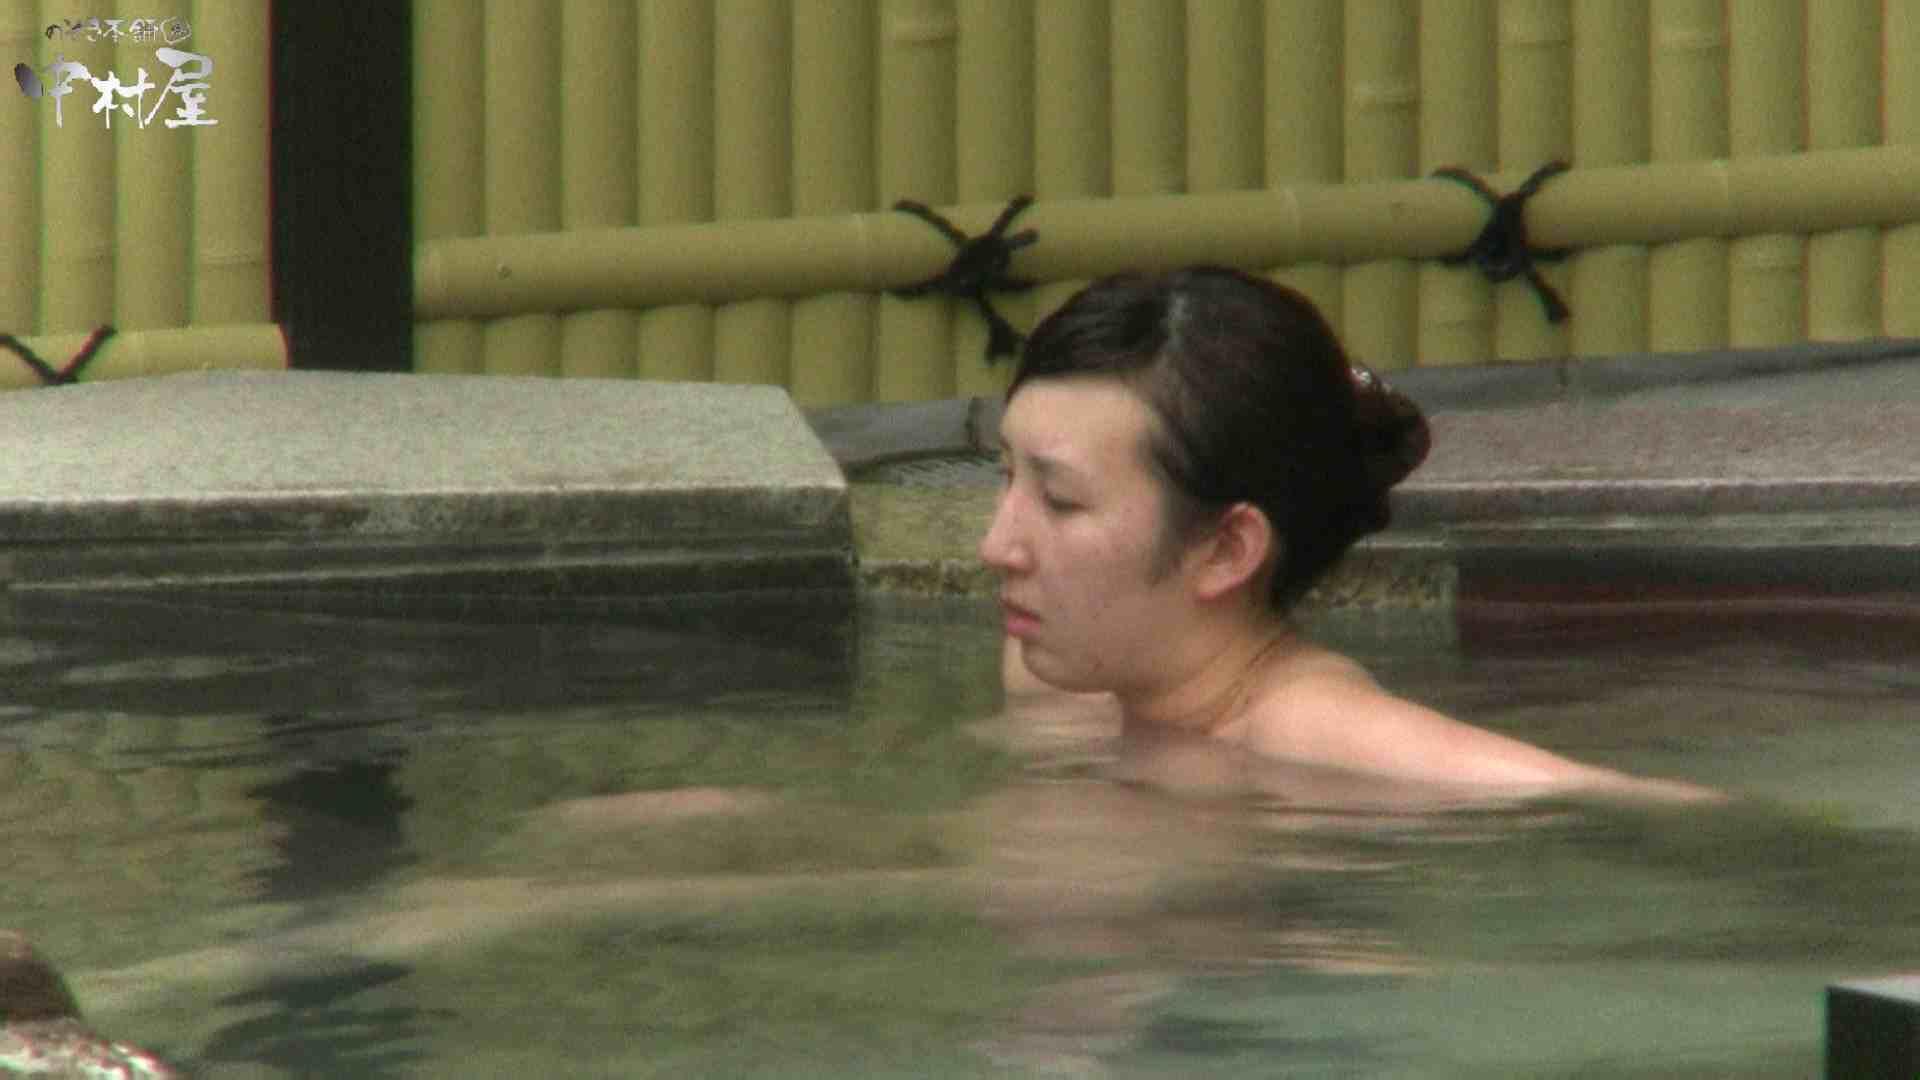 Aquaな露天風呂Vol.948 盗撮   HなOL  78pic 14